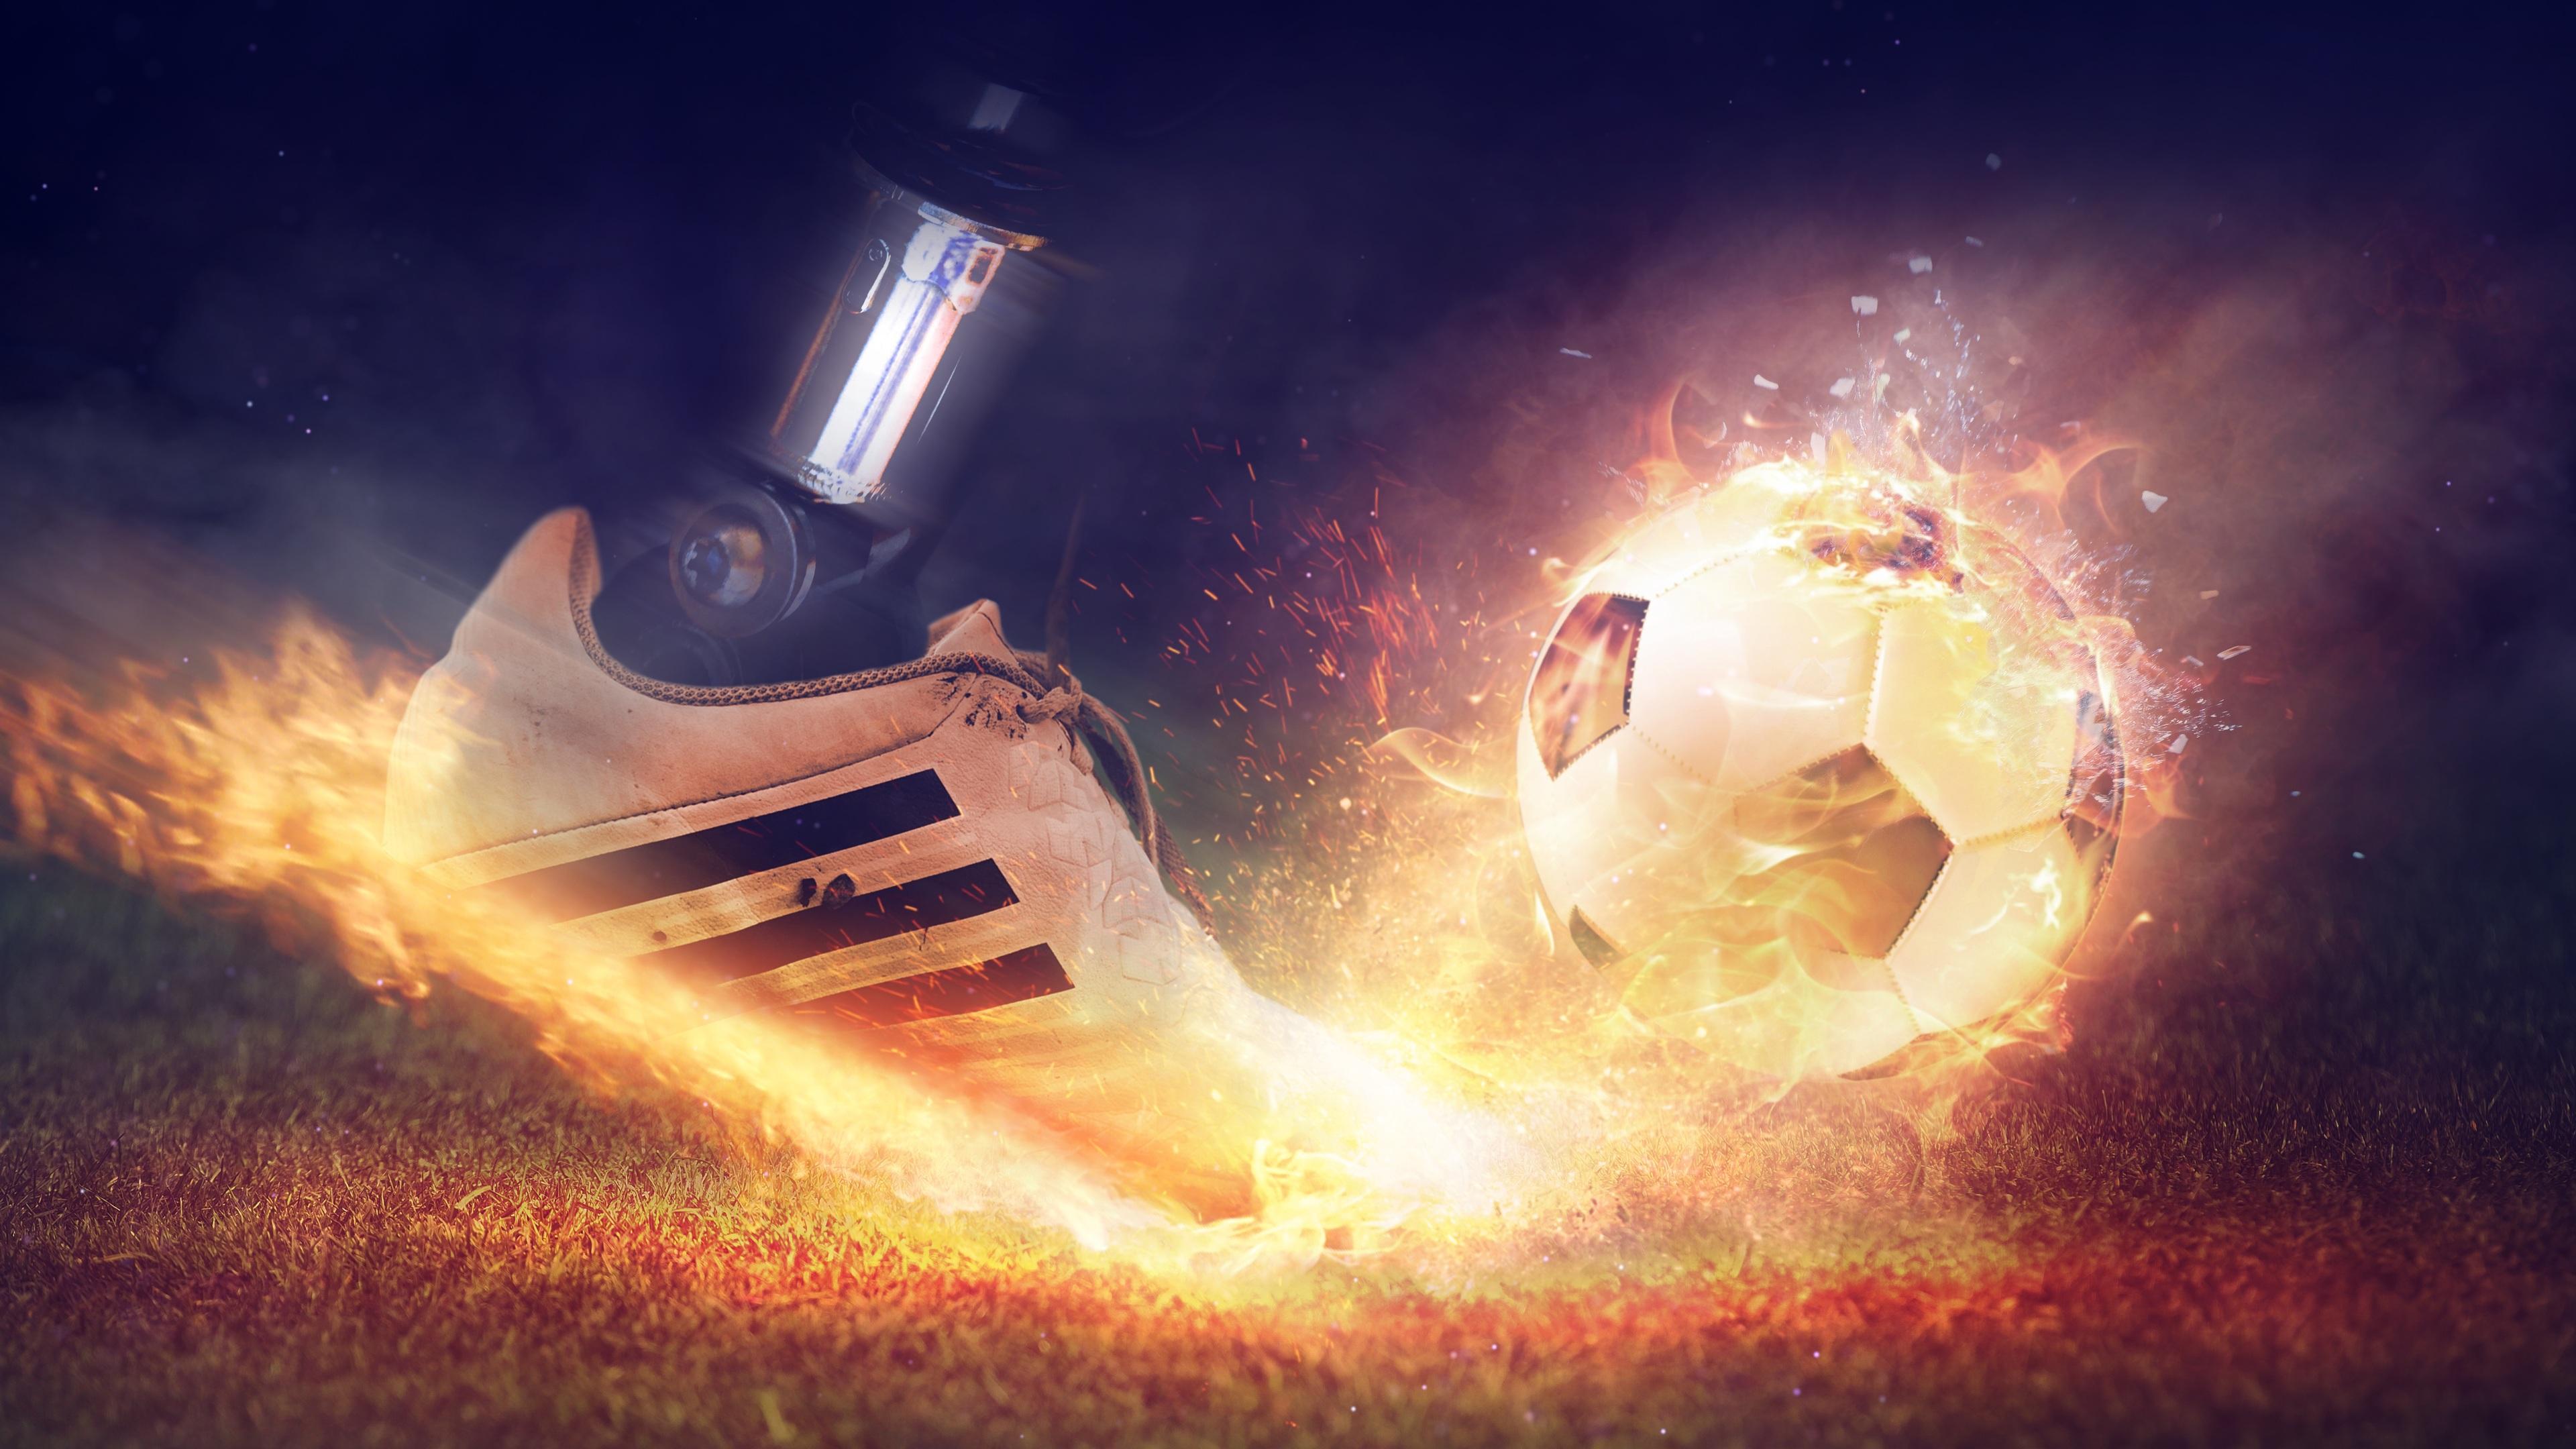 football shoe fire smoke 5k 1538786821 - Football Shoe Fire Smoke 5k - sports wallpapers, smoke wallpapers, shoe wallpapers, hd-wallpapers, football wallpapers, fire wallpapers, 5k wallpapers, 4k-wallpapers